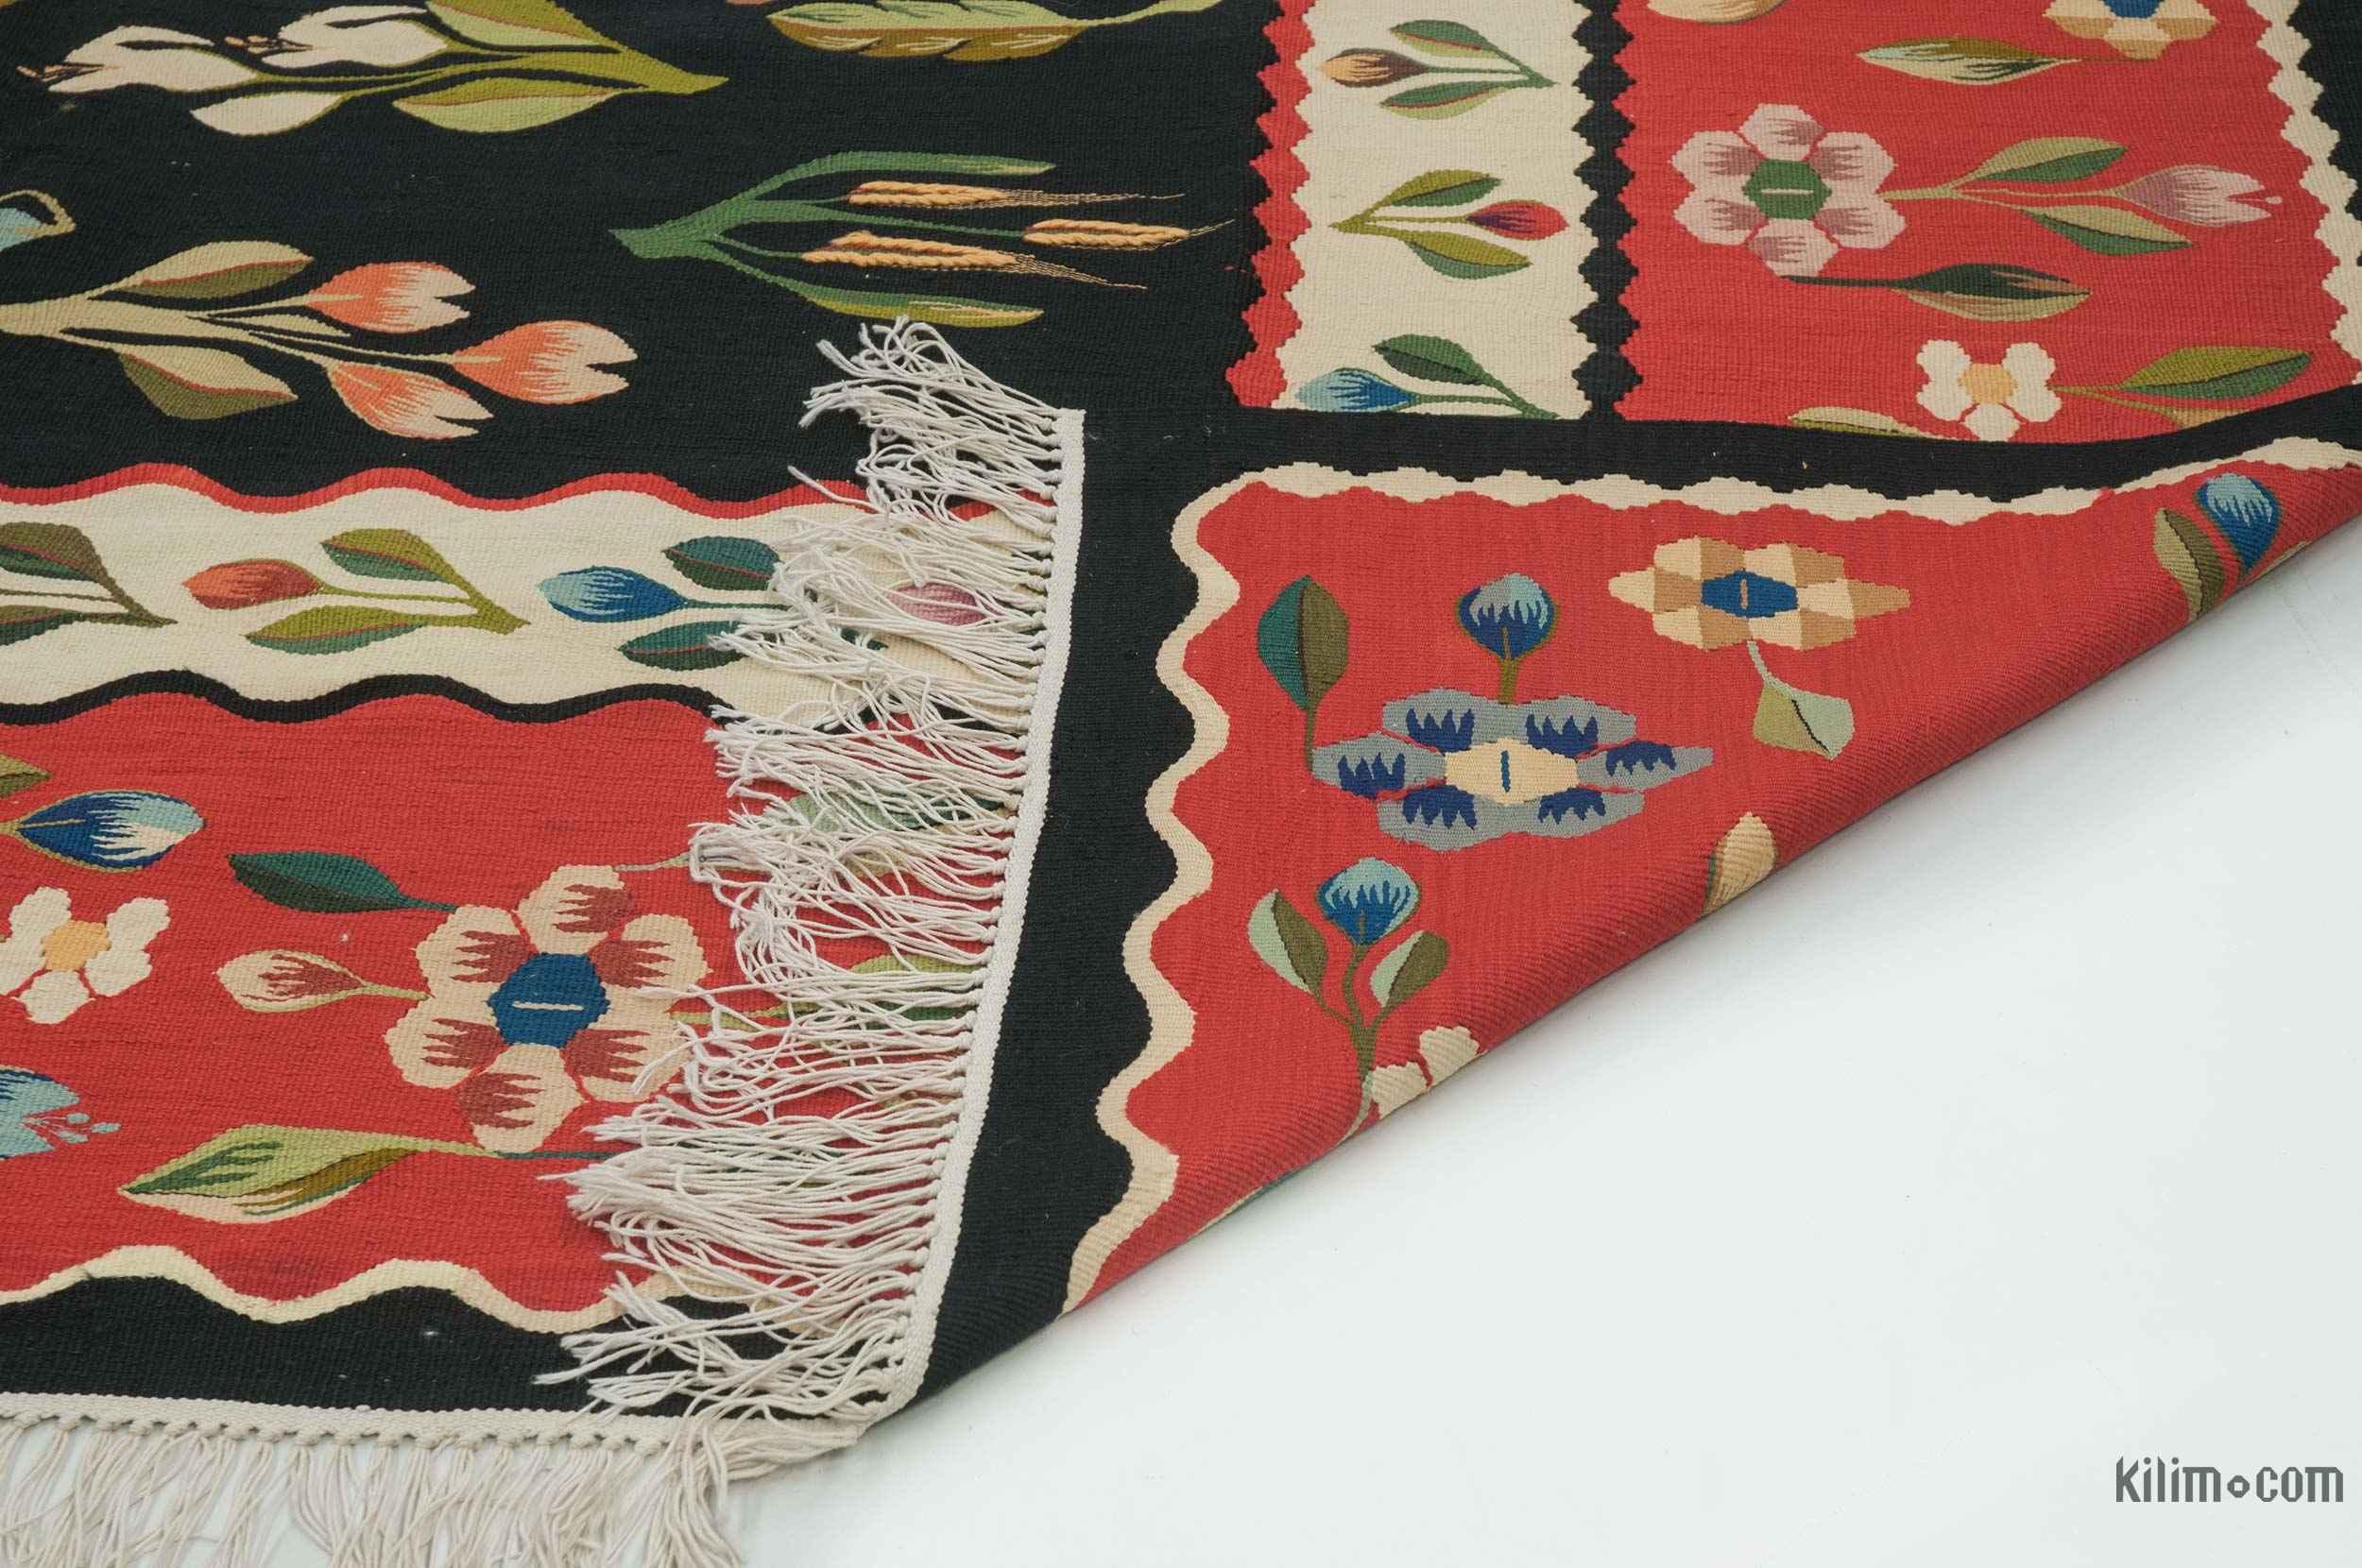 K0020820 Black Red Vintage Romanian Kilim Rug 6 8 Quot X 10